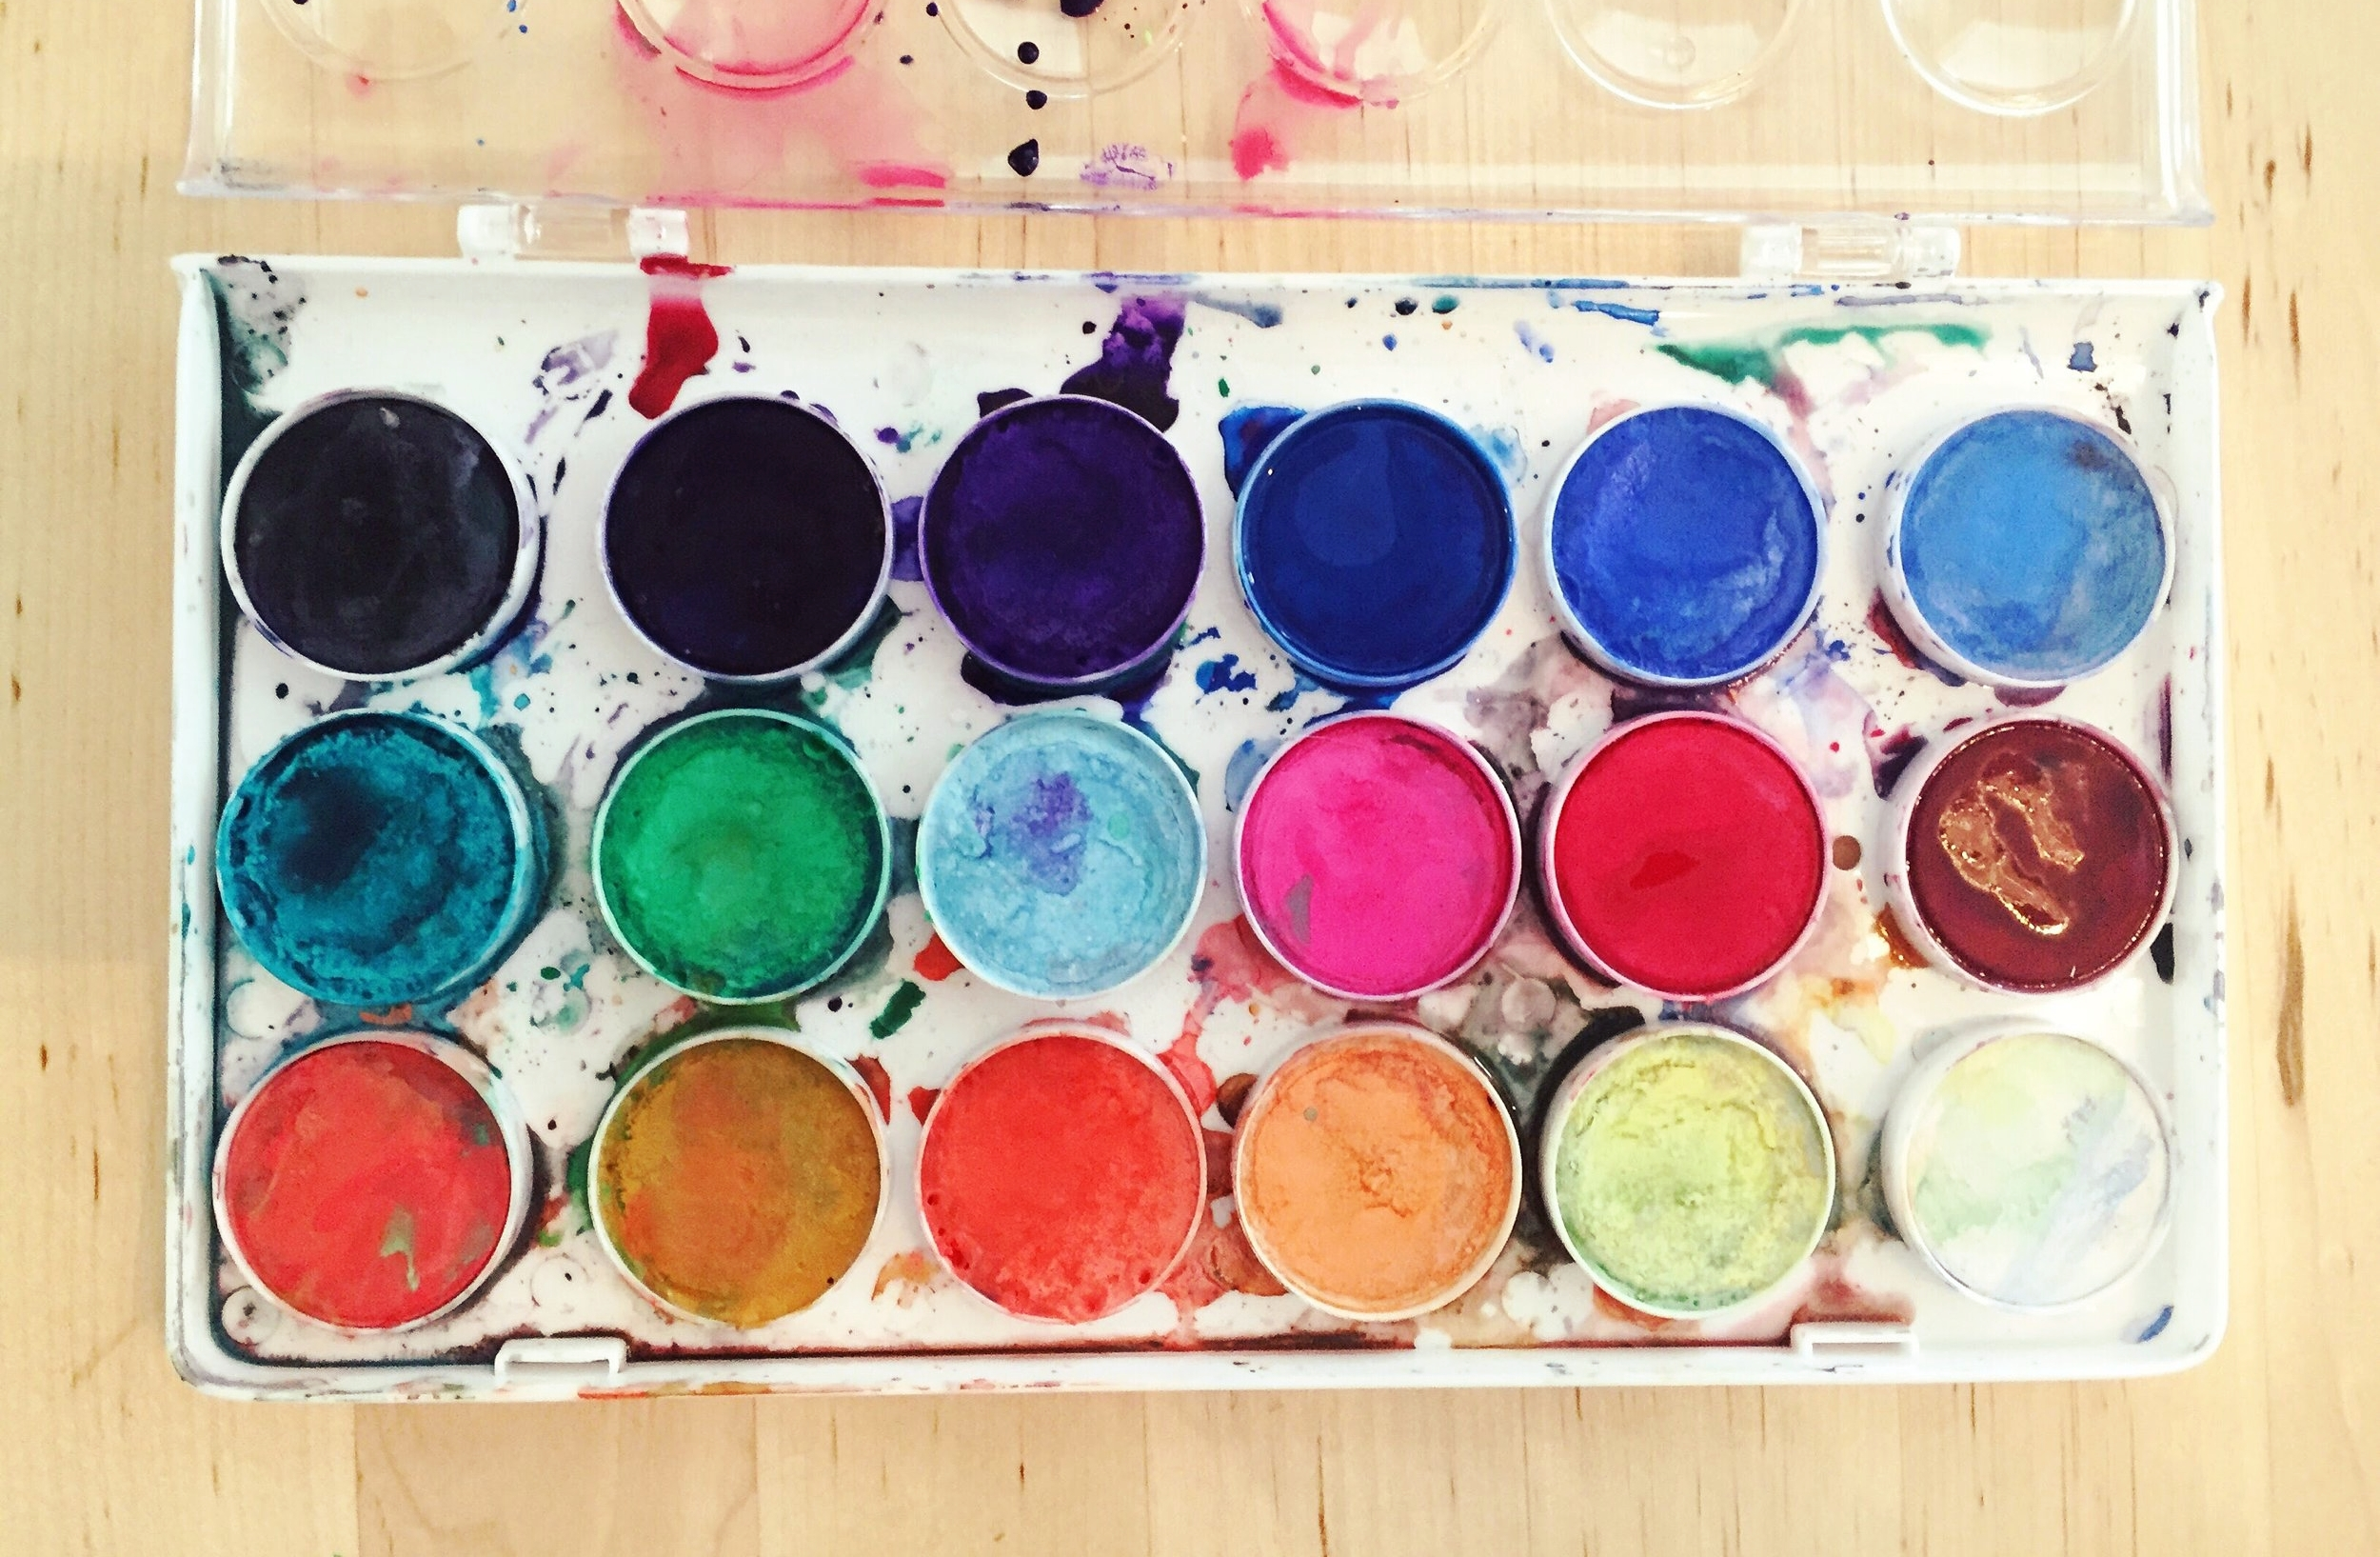 I love watercolors!